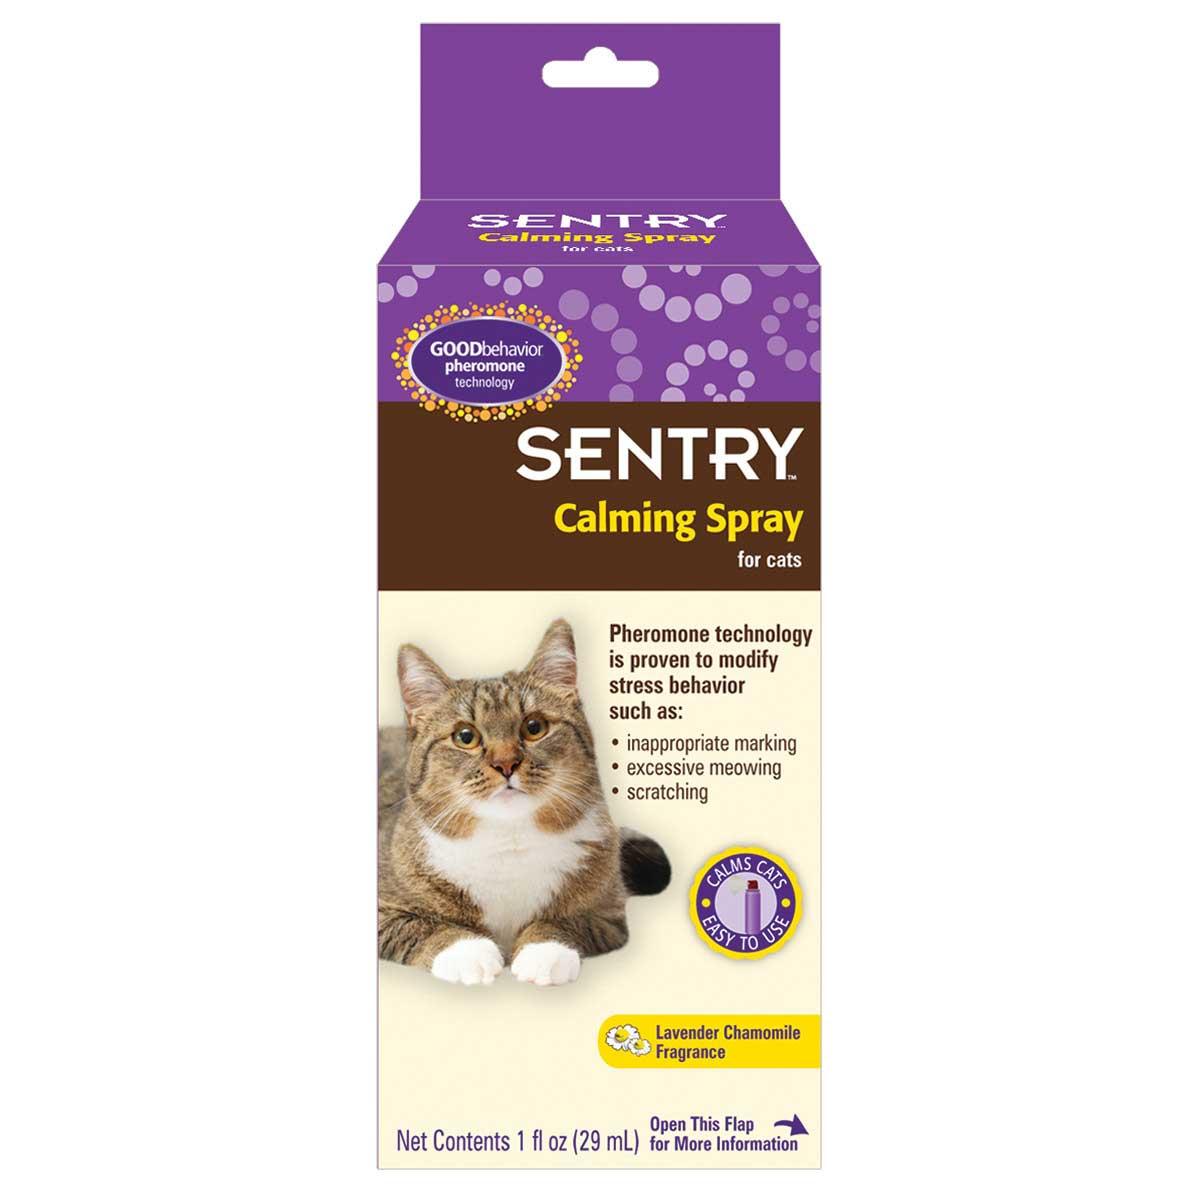 Sentry Calming Spray for Cats 1 oz